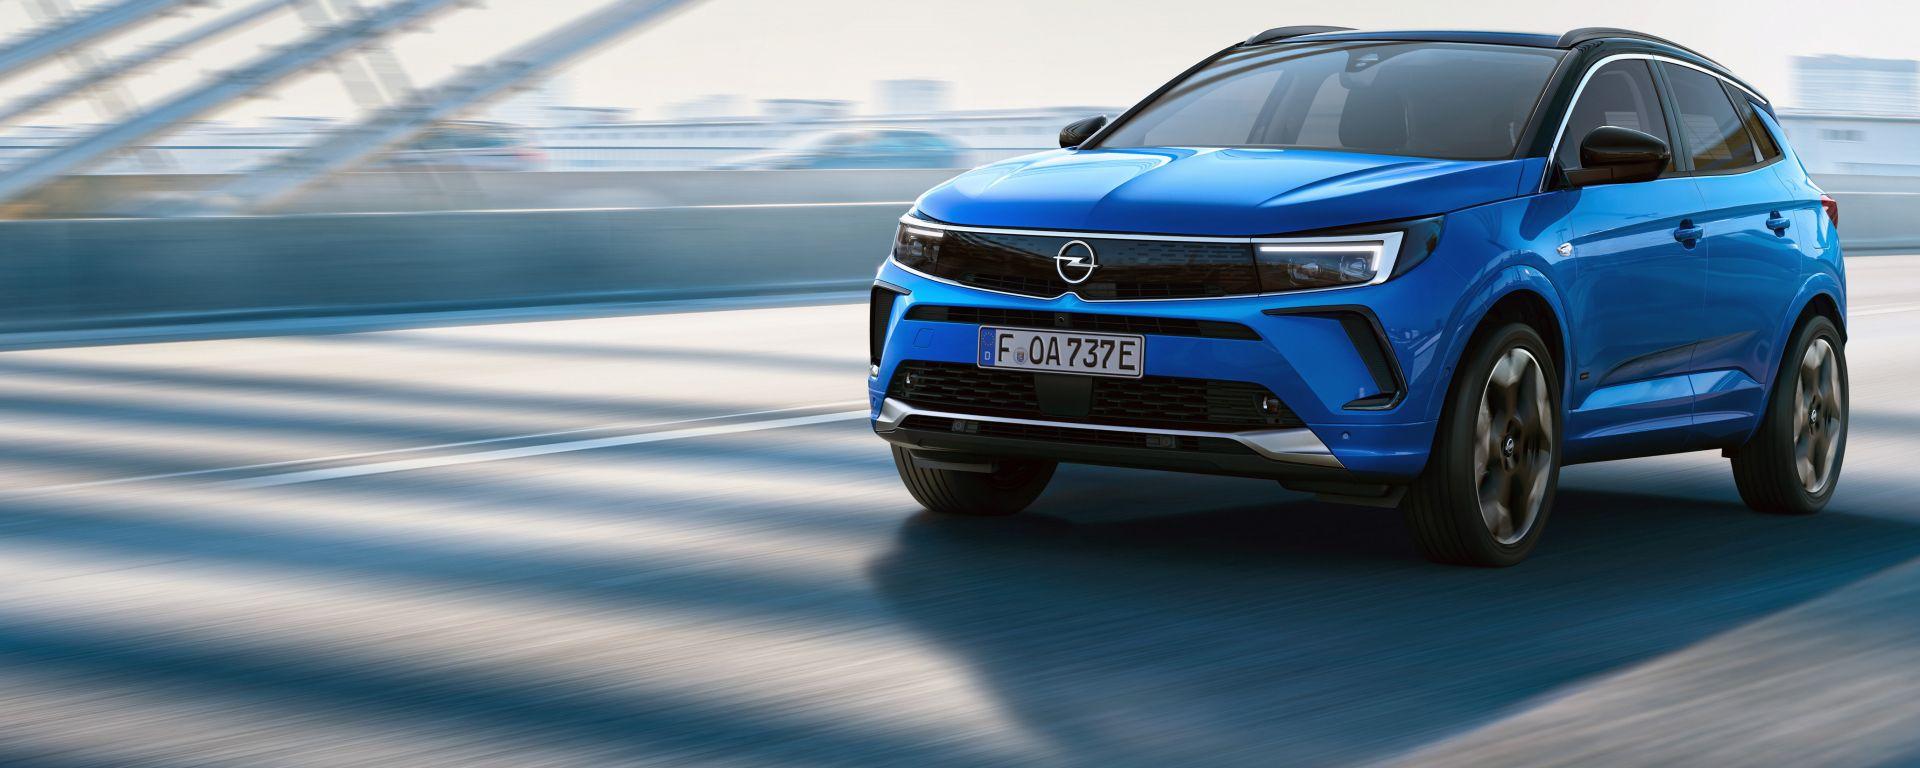 Opel Grandland 2021, fotogallery